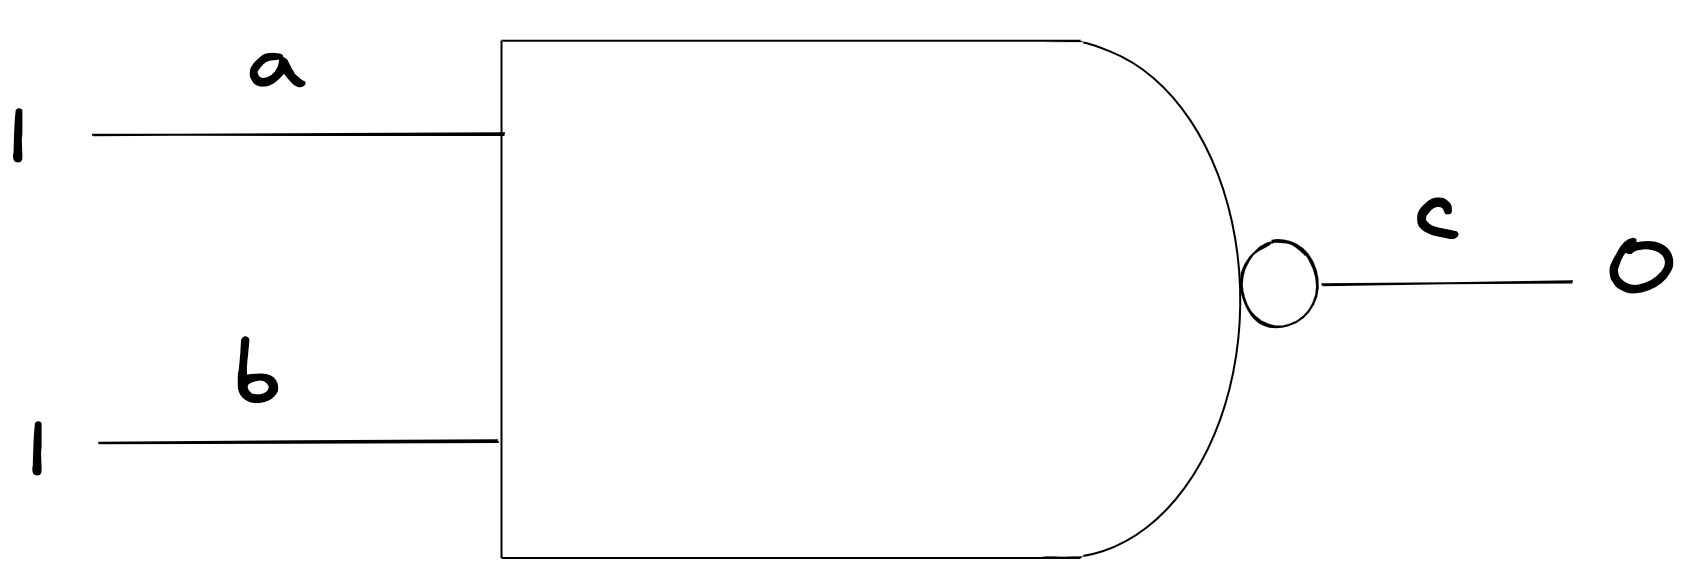 umair-akbar-aHR0cHM6Ly91c2VyLWltYWdlcy5naXRodWJ1c2VyY29udGVudC5jb20vOTg0NTc0Lzk1Nzc2NTI0LTg0NTczYjgwLTBjOTItMTFlYi05NWMyLWJlMWQ4MzFlNTg5MC5wbmc - Simulating RAM in Clojure